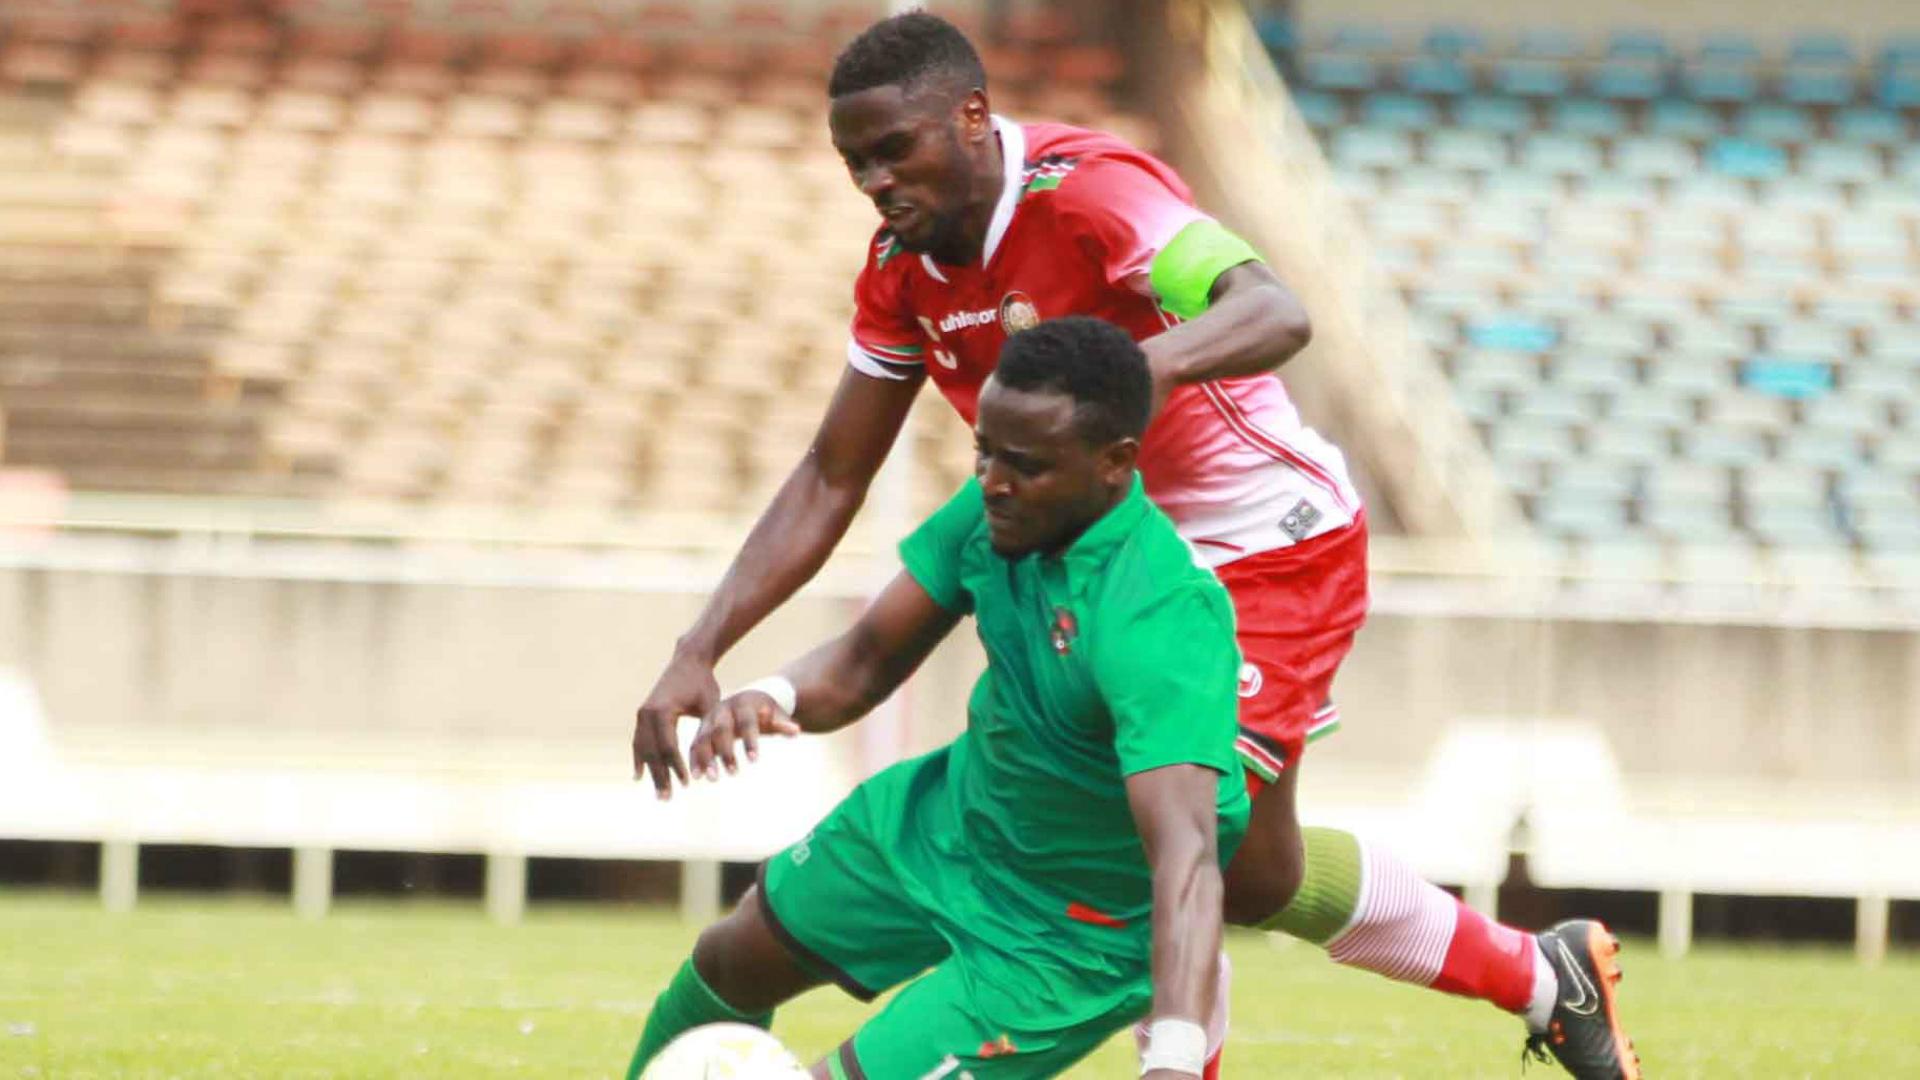 Musa Mohammed: Former Gor Mahia captain confirms transfer talks with Yanga SC